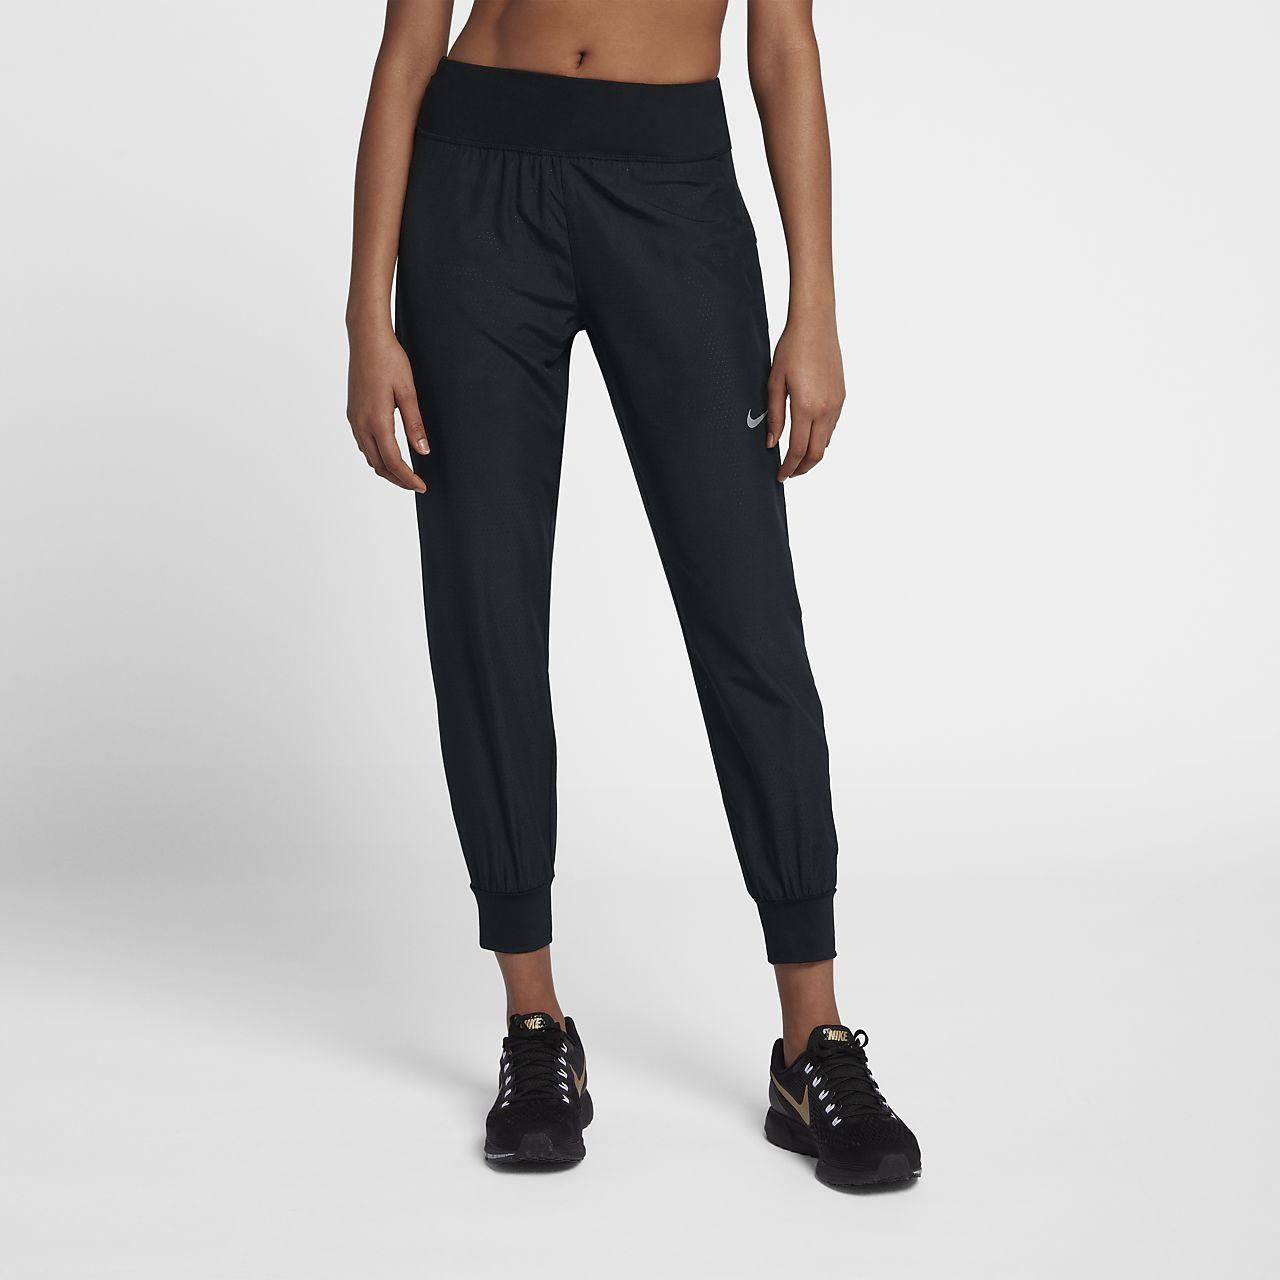 Low Resolution Nike Essential Women's Running Trousers Nike Essential  Women's Running Trousers